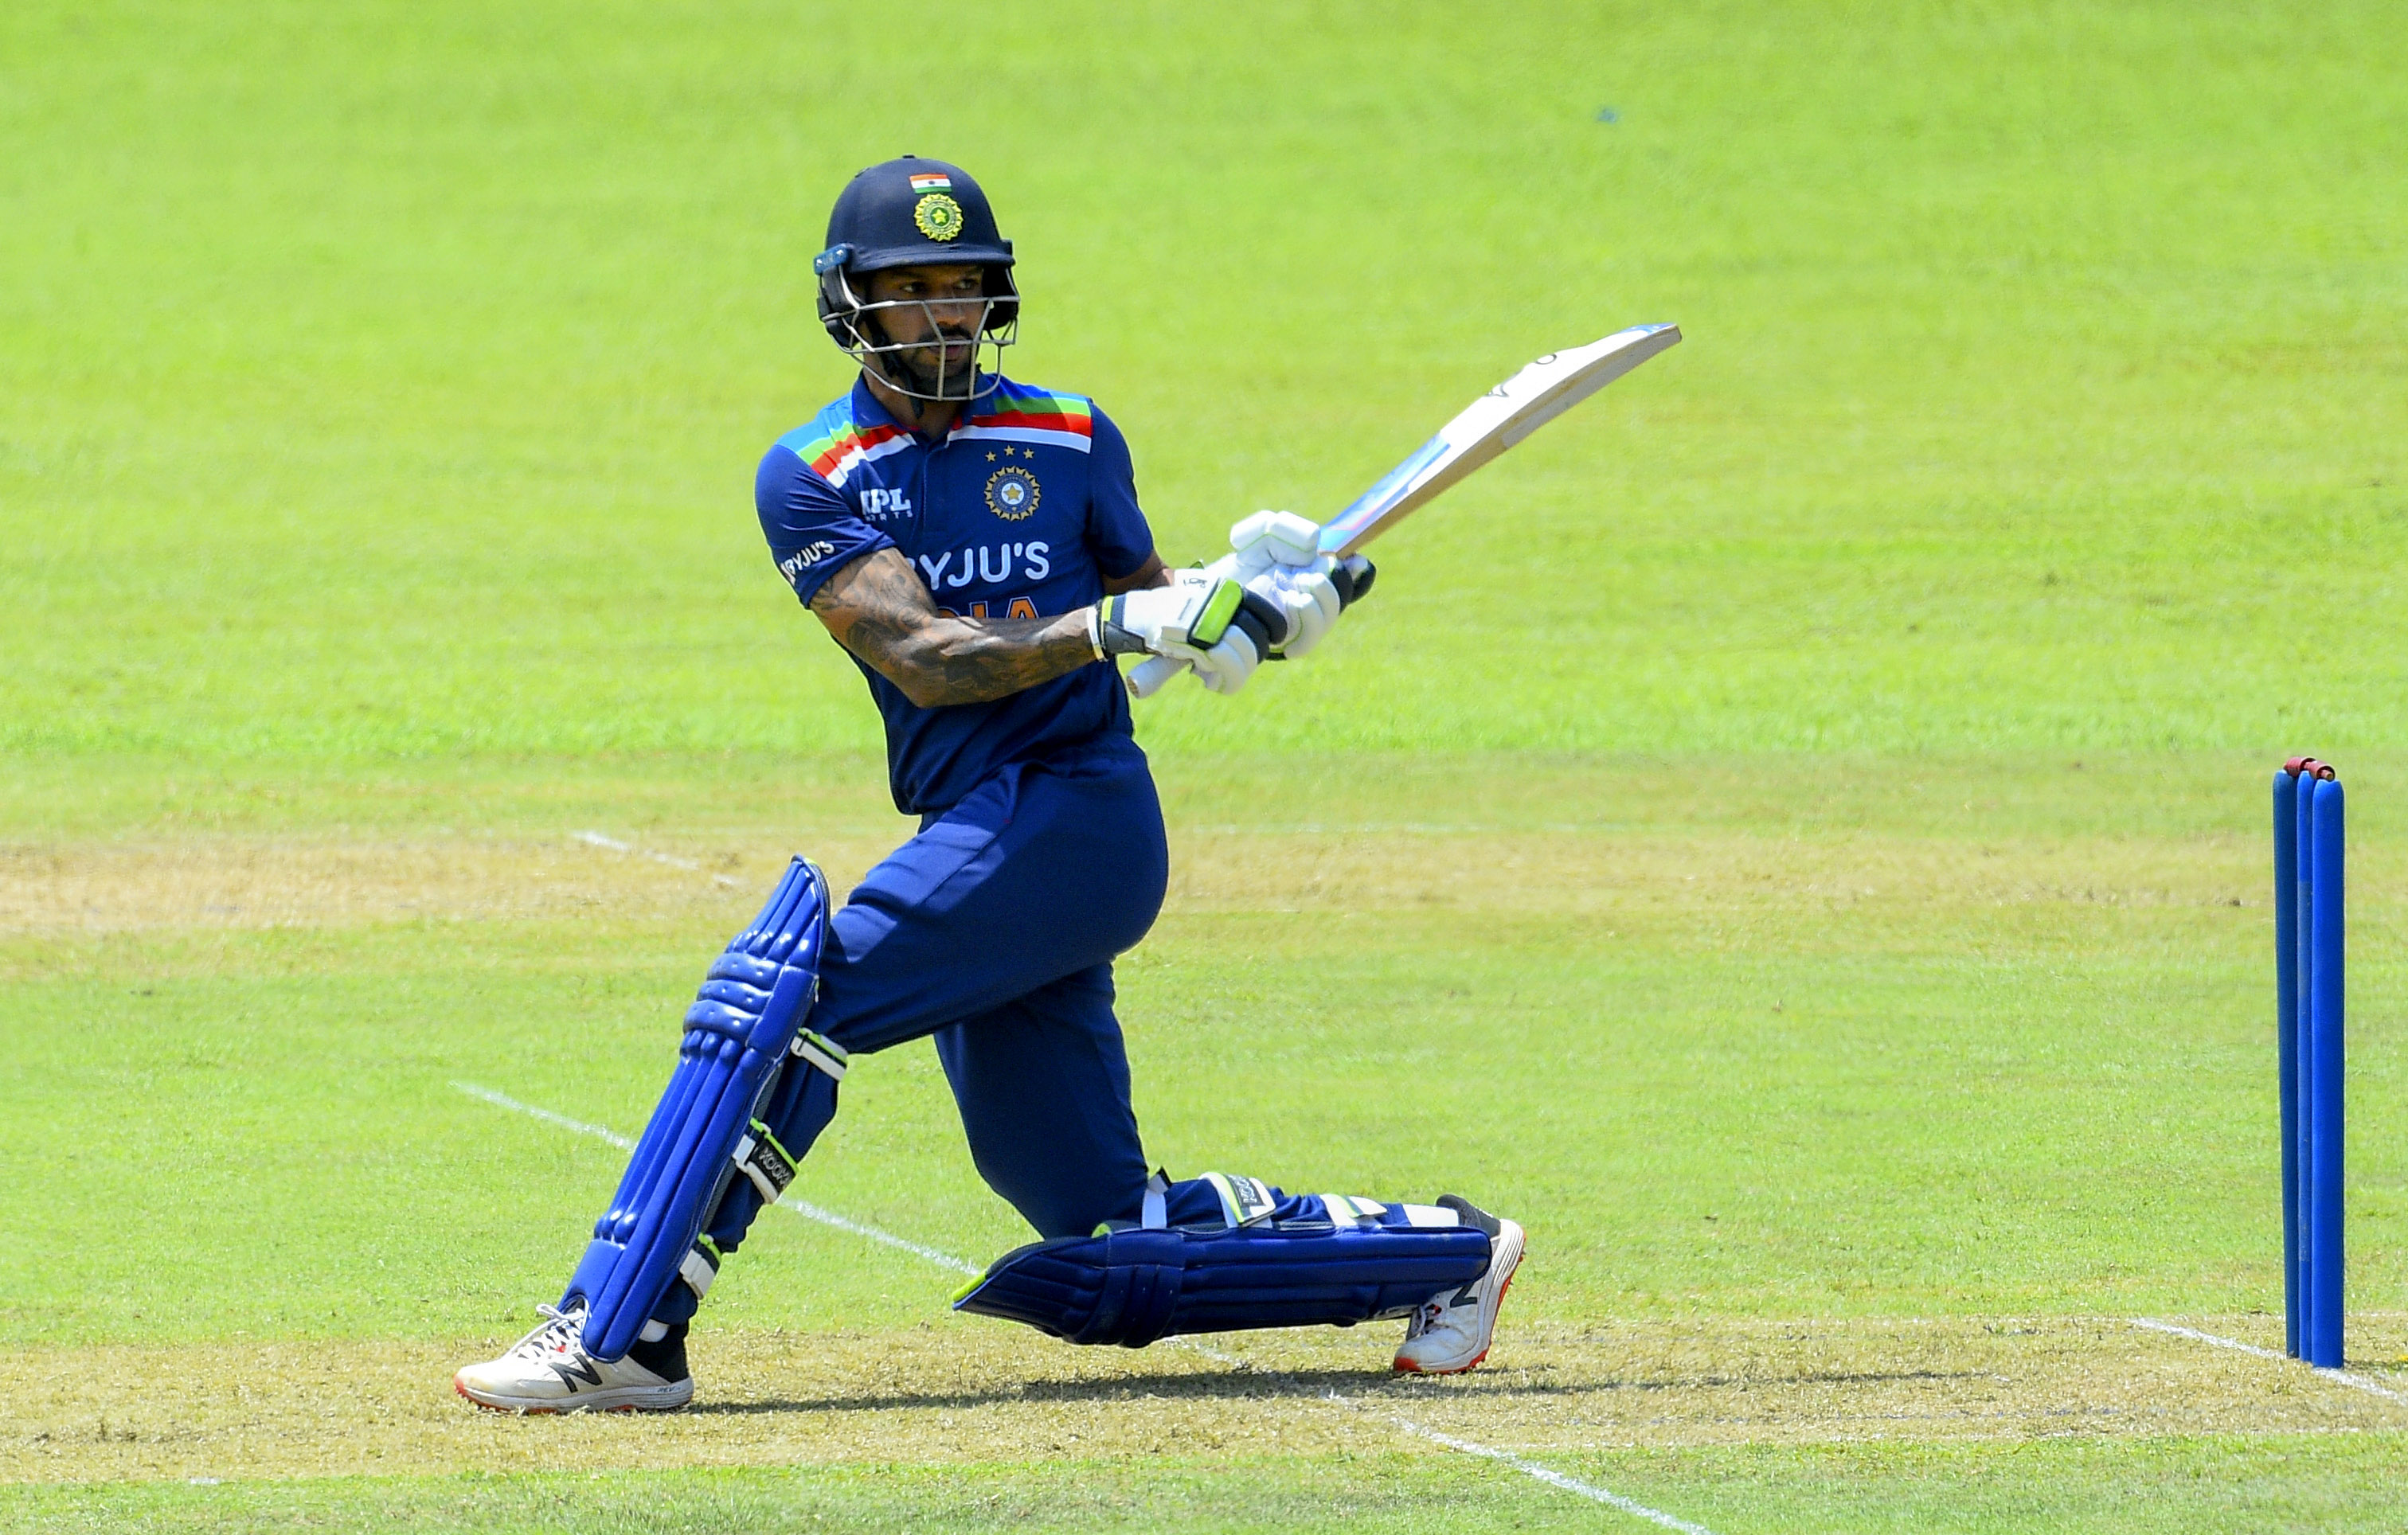 This will be Shikhar Dhawan's debut as India captain   BCCI